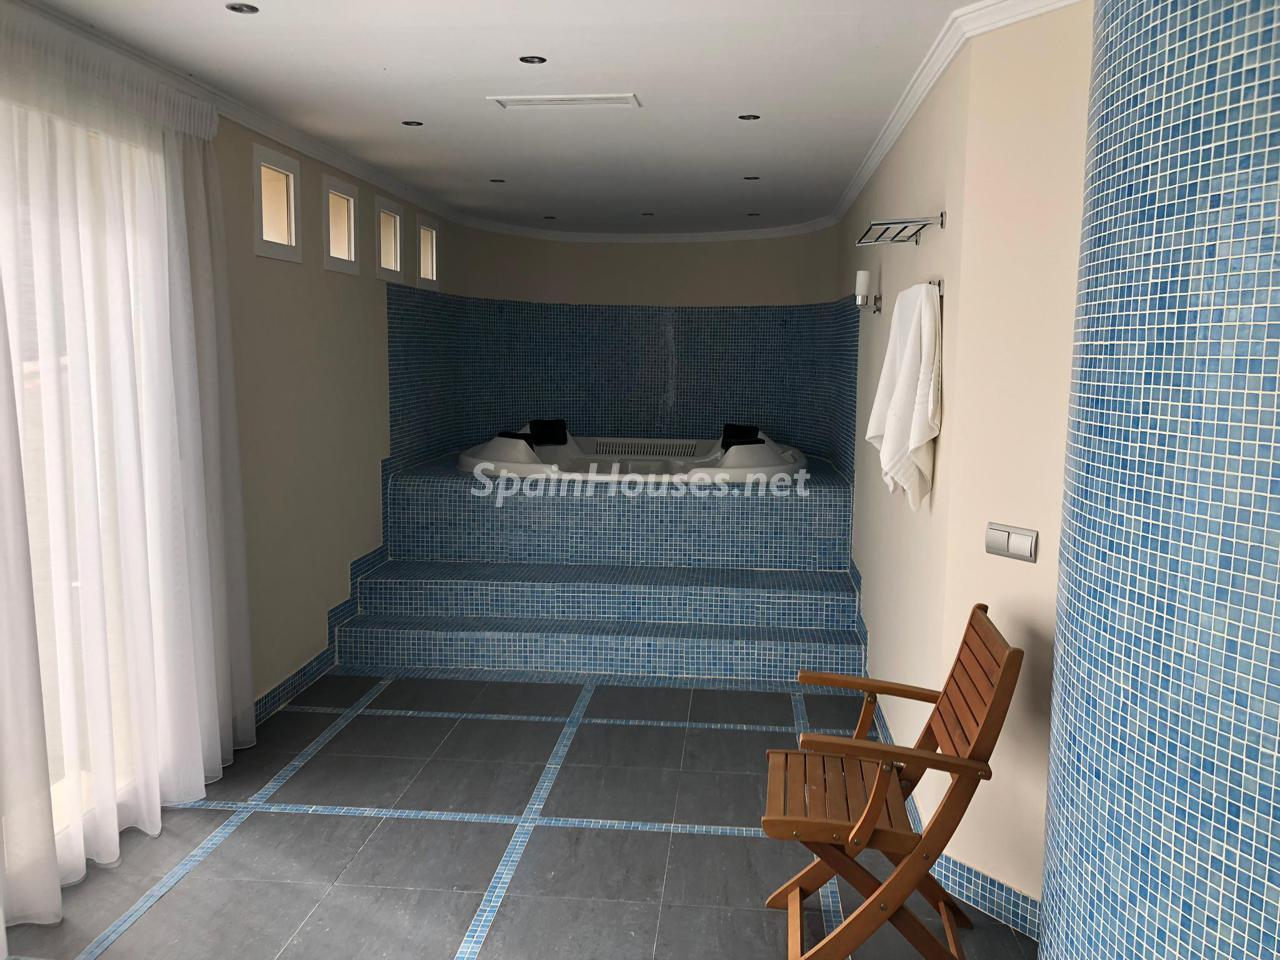 69700916 3159947 foto 775924 - Roman design, elegance and luxury in this wonderful villa in Benahavís